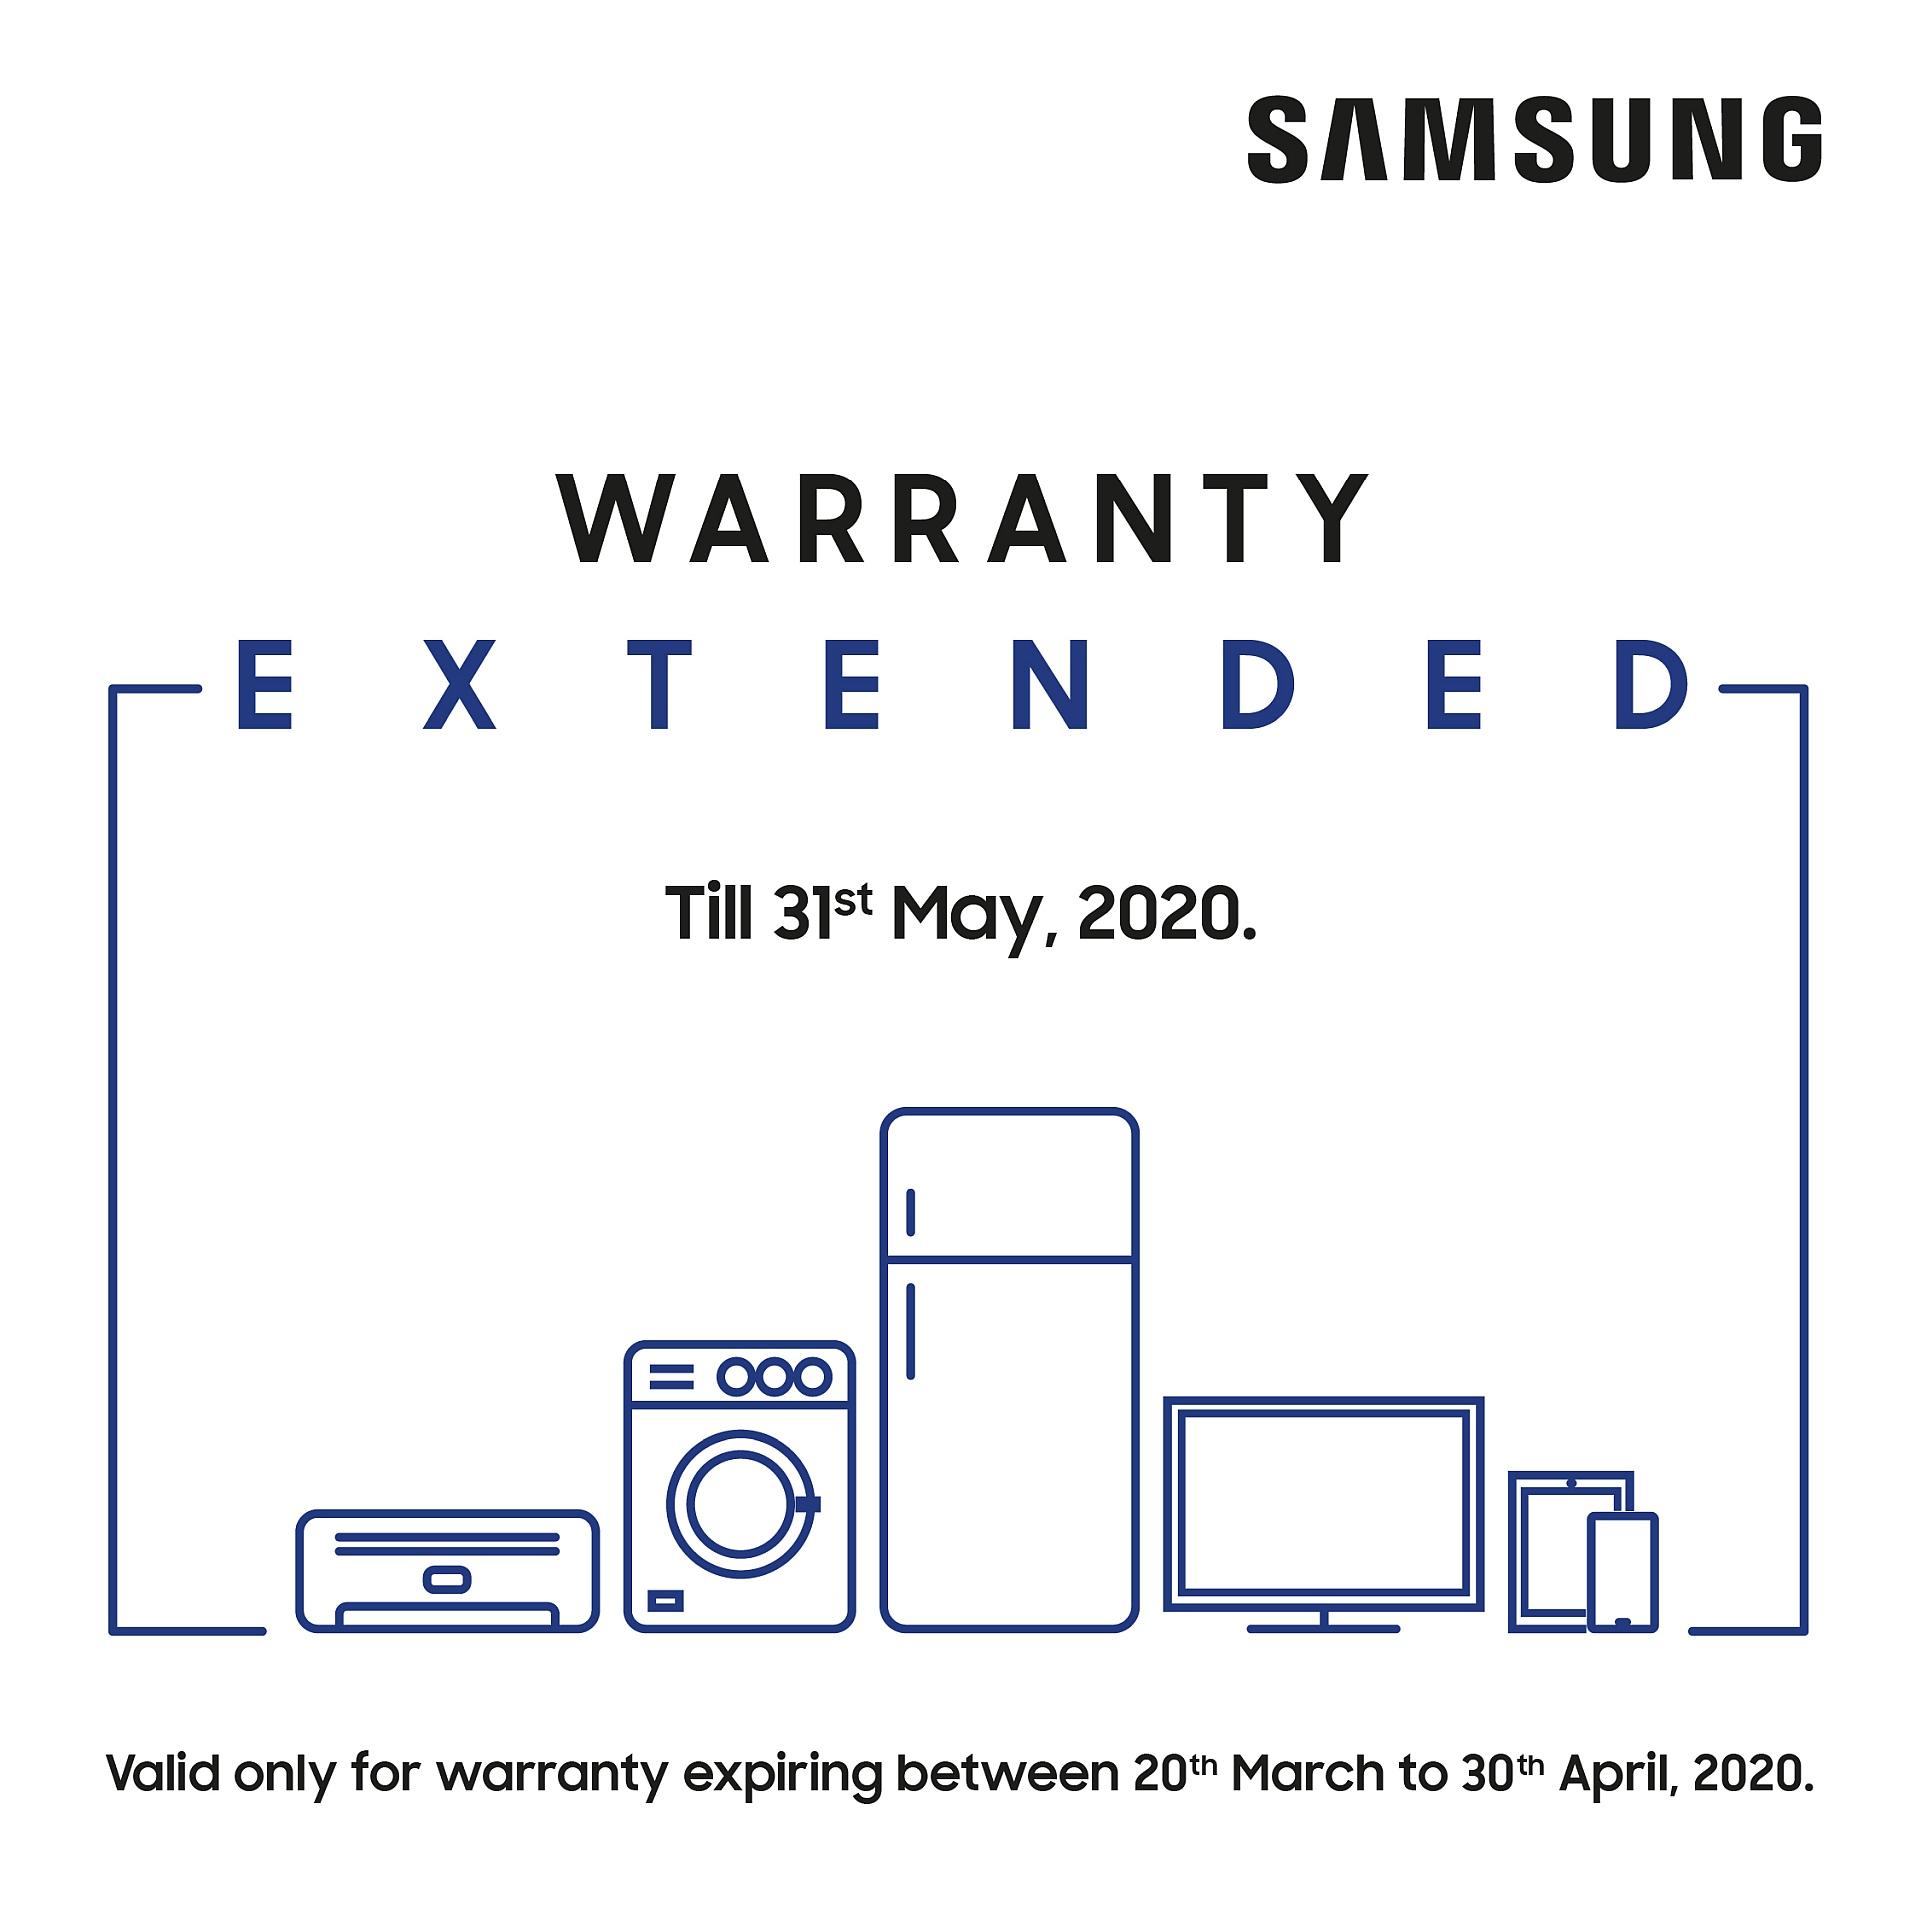 Samsung India warranty extension